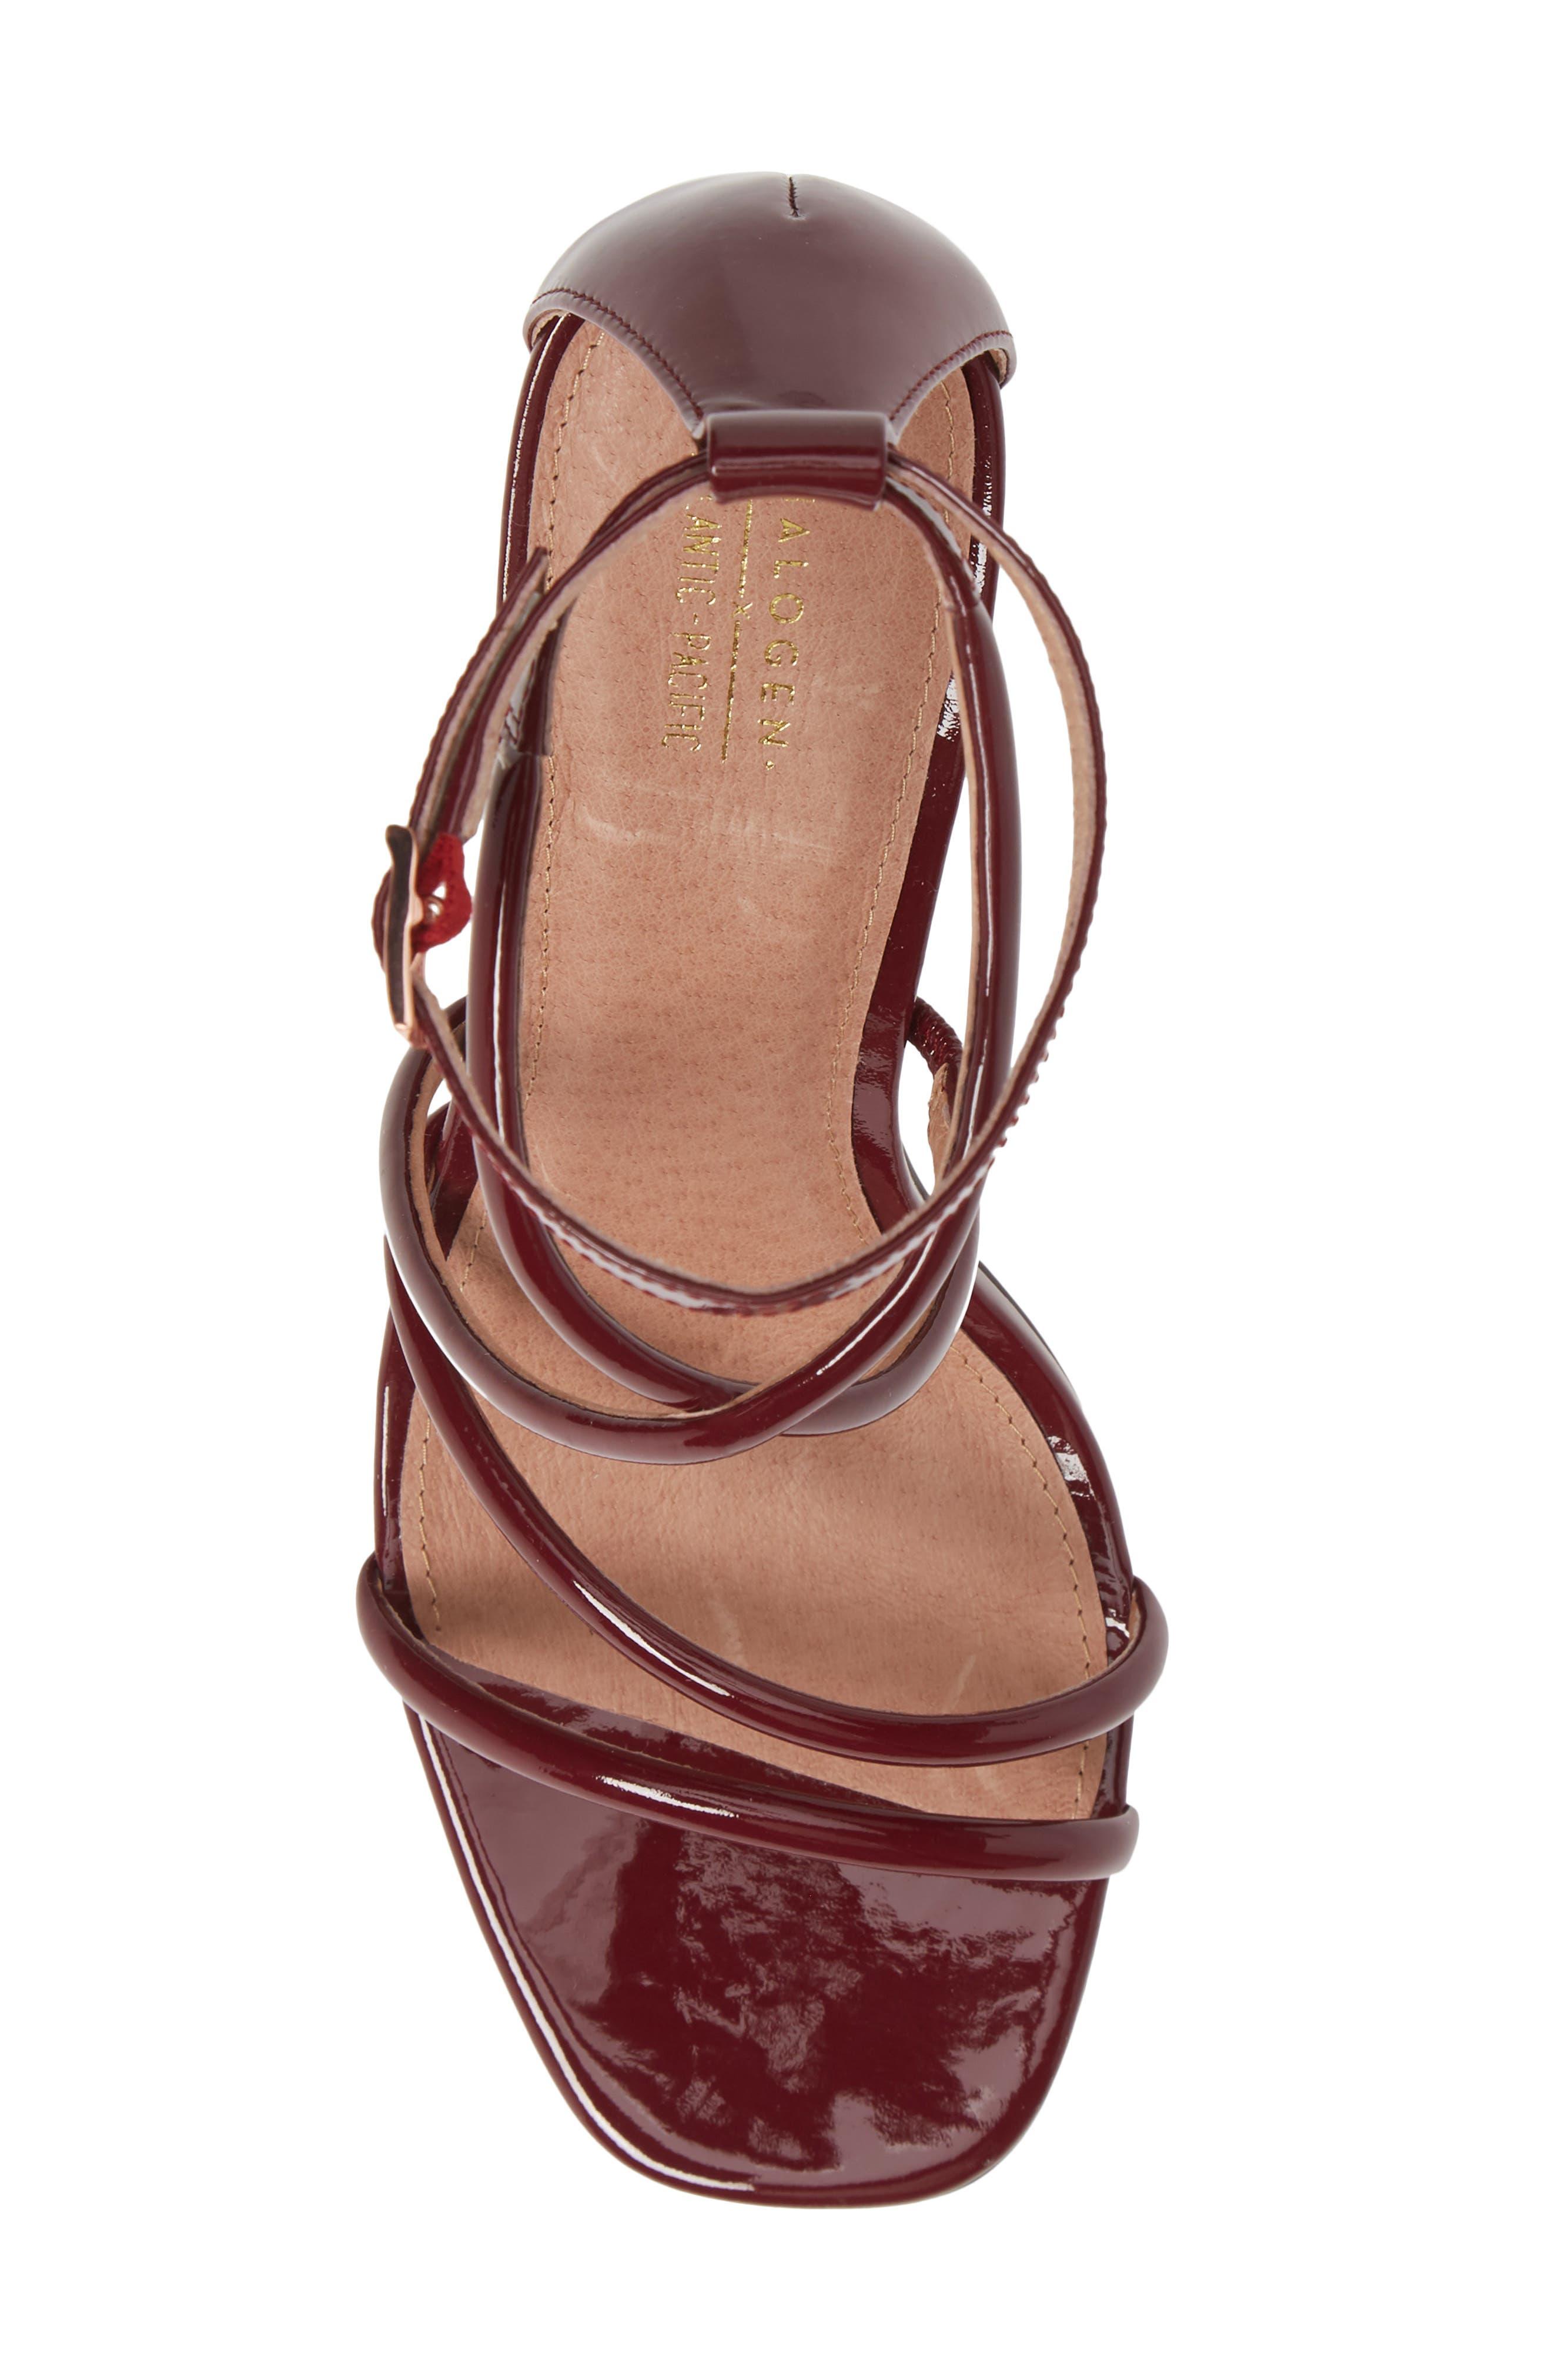 x Atlantic-Pacific Violetta Multi Strap Sandal,                             Alternate thumbnail 5, color,                             MERLOT PATENT